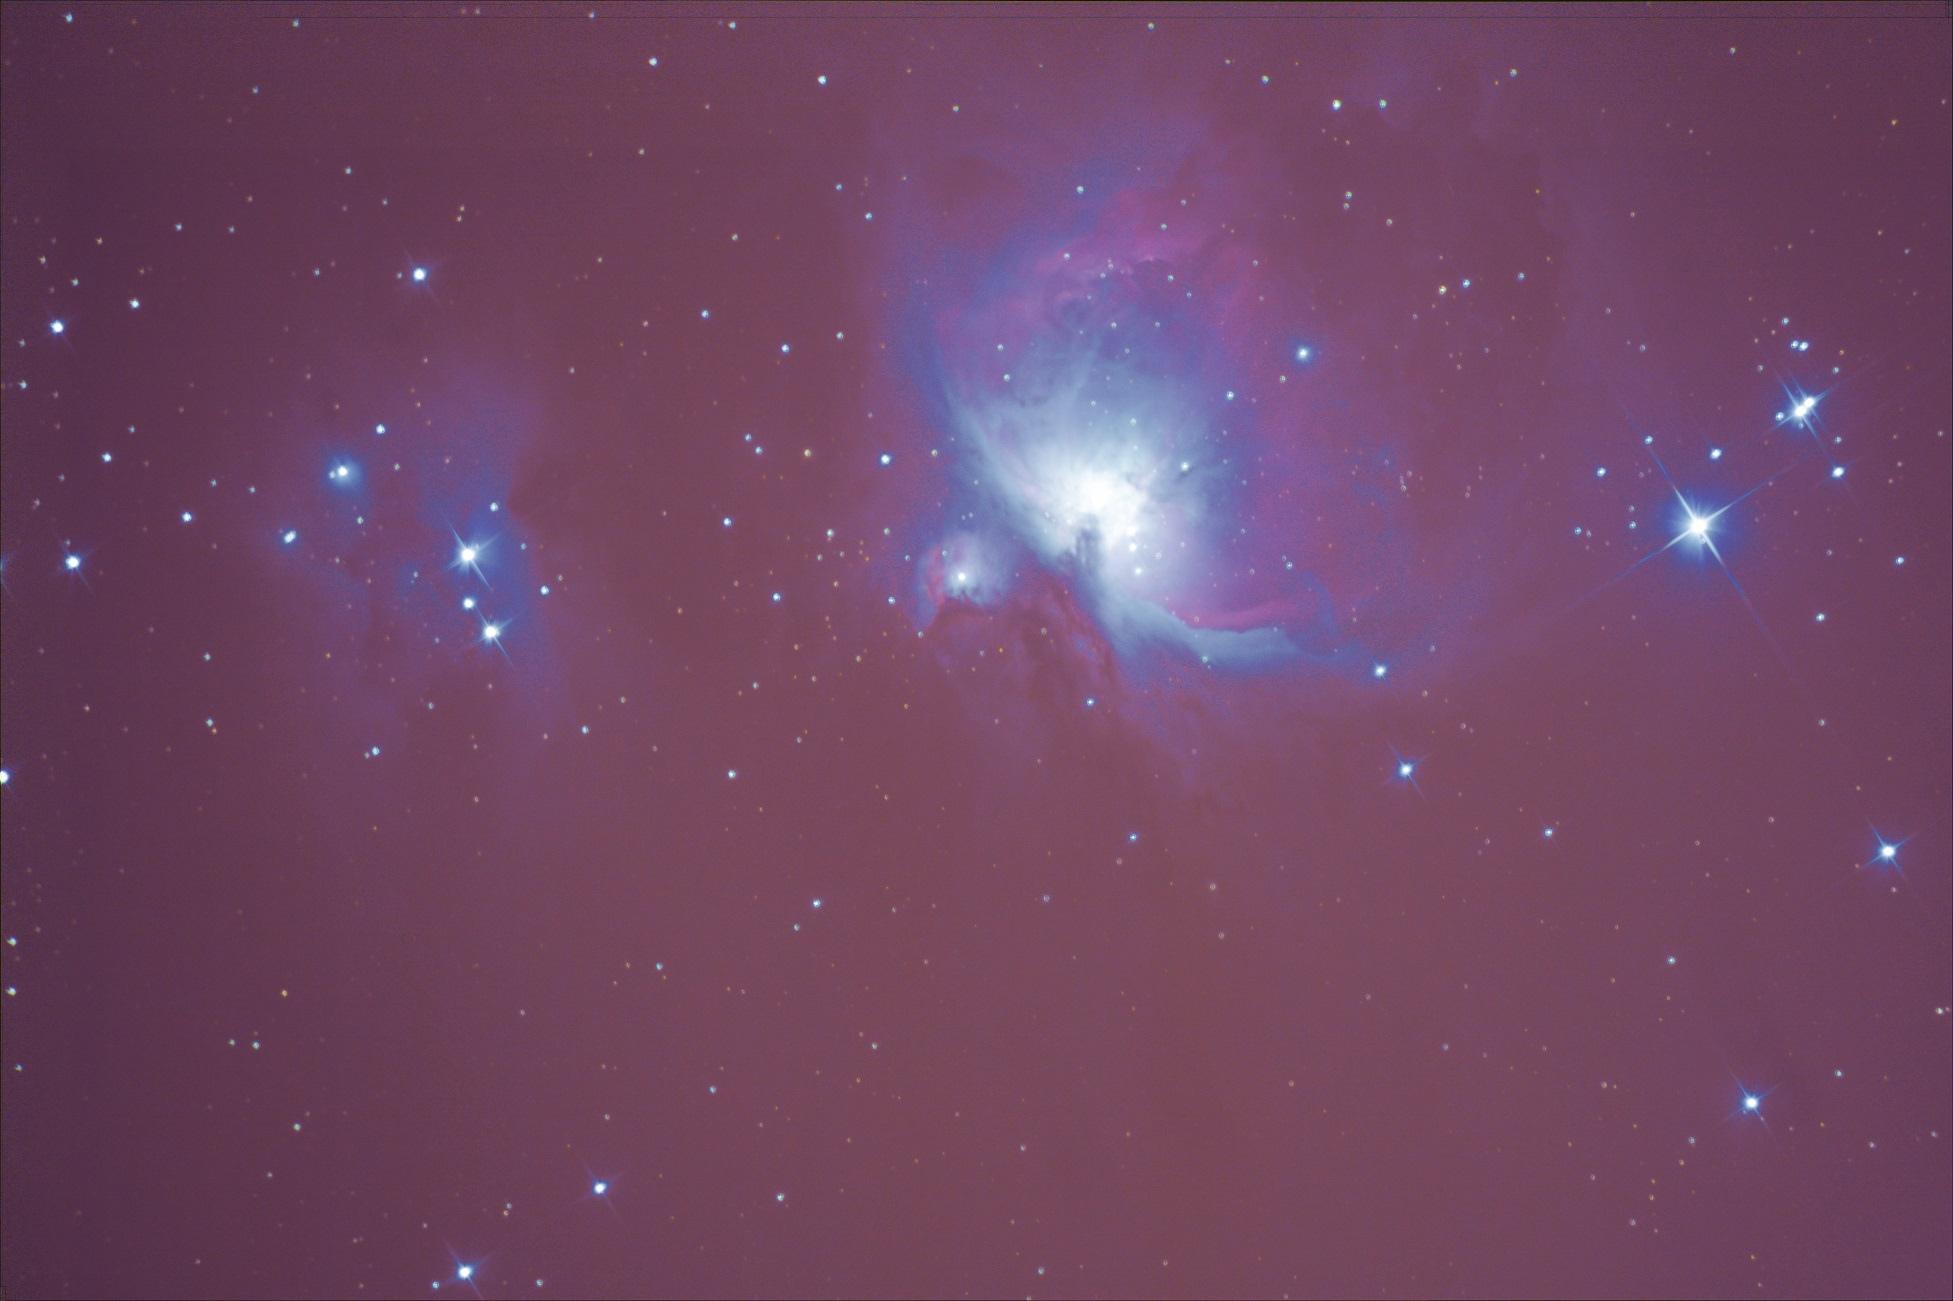 5e0a7b0e0cbb7_Orion30-12-2019150-750neq51000D50x45sDSS.jpg.2a7df9a2c43f7dfe11e3c1bcb6ad3273.jpg